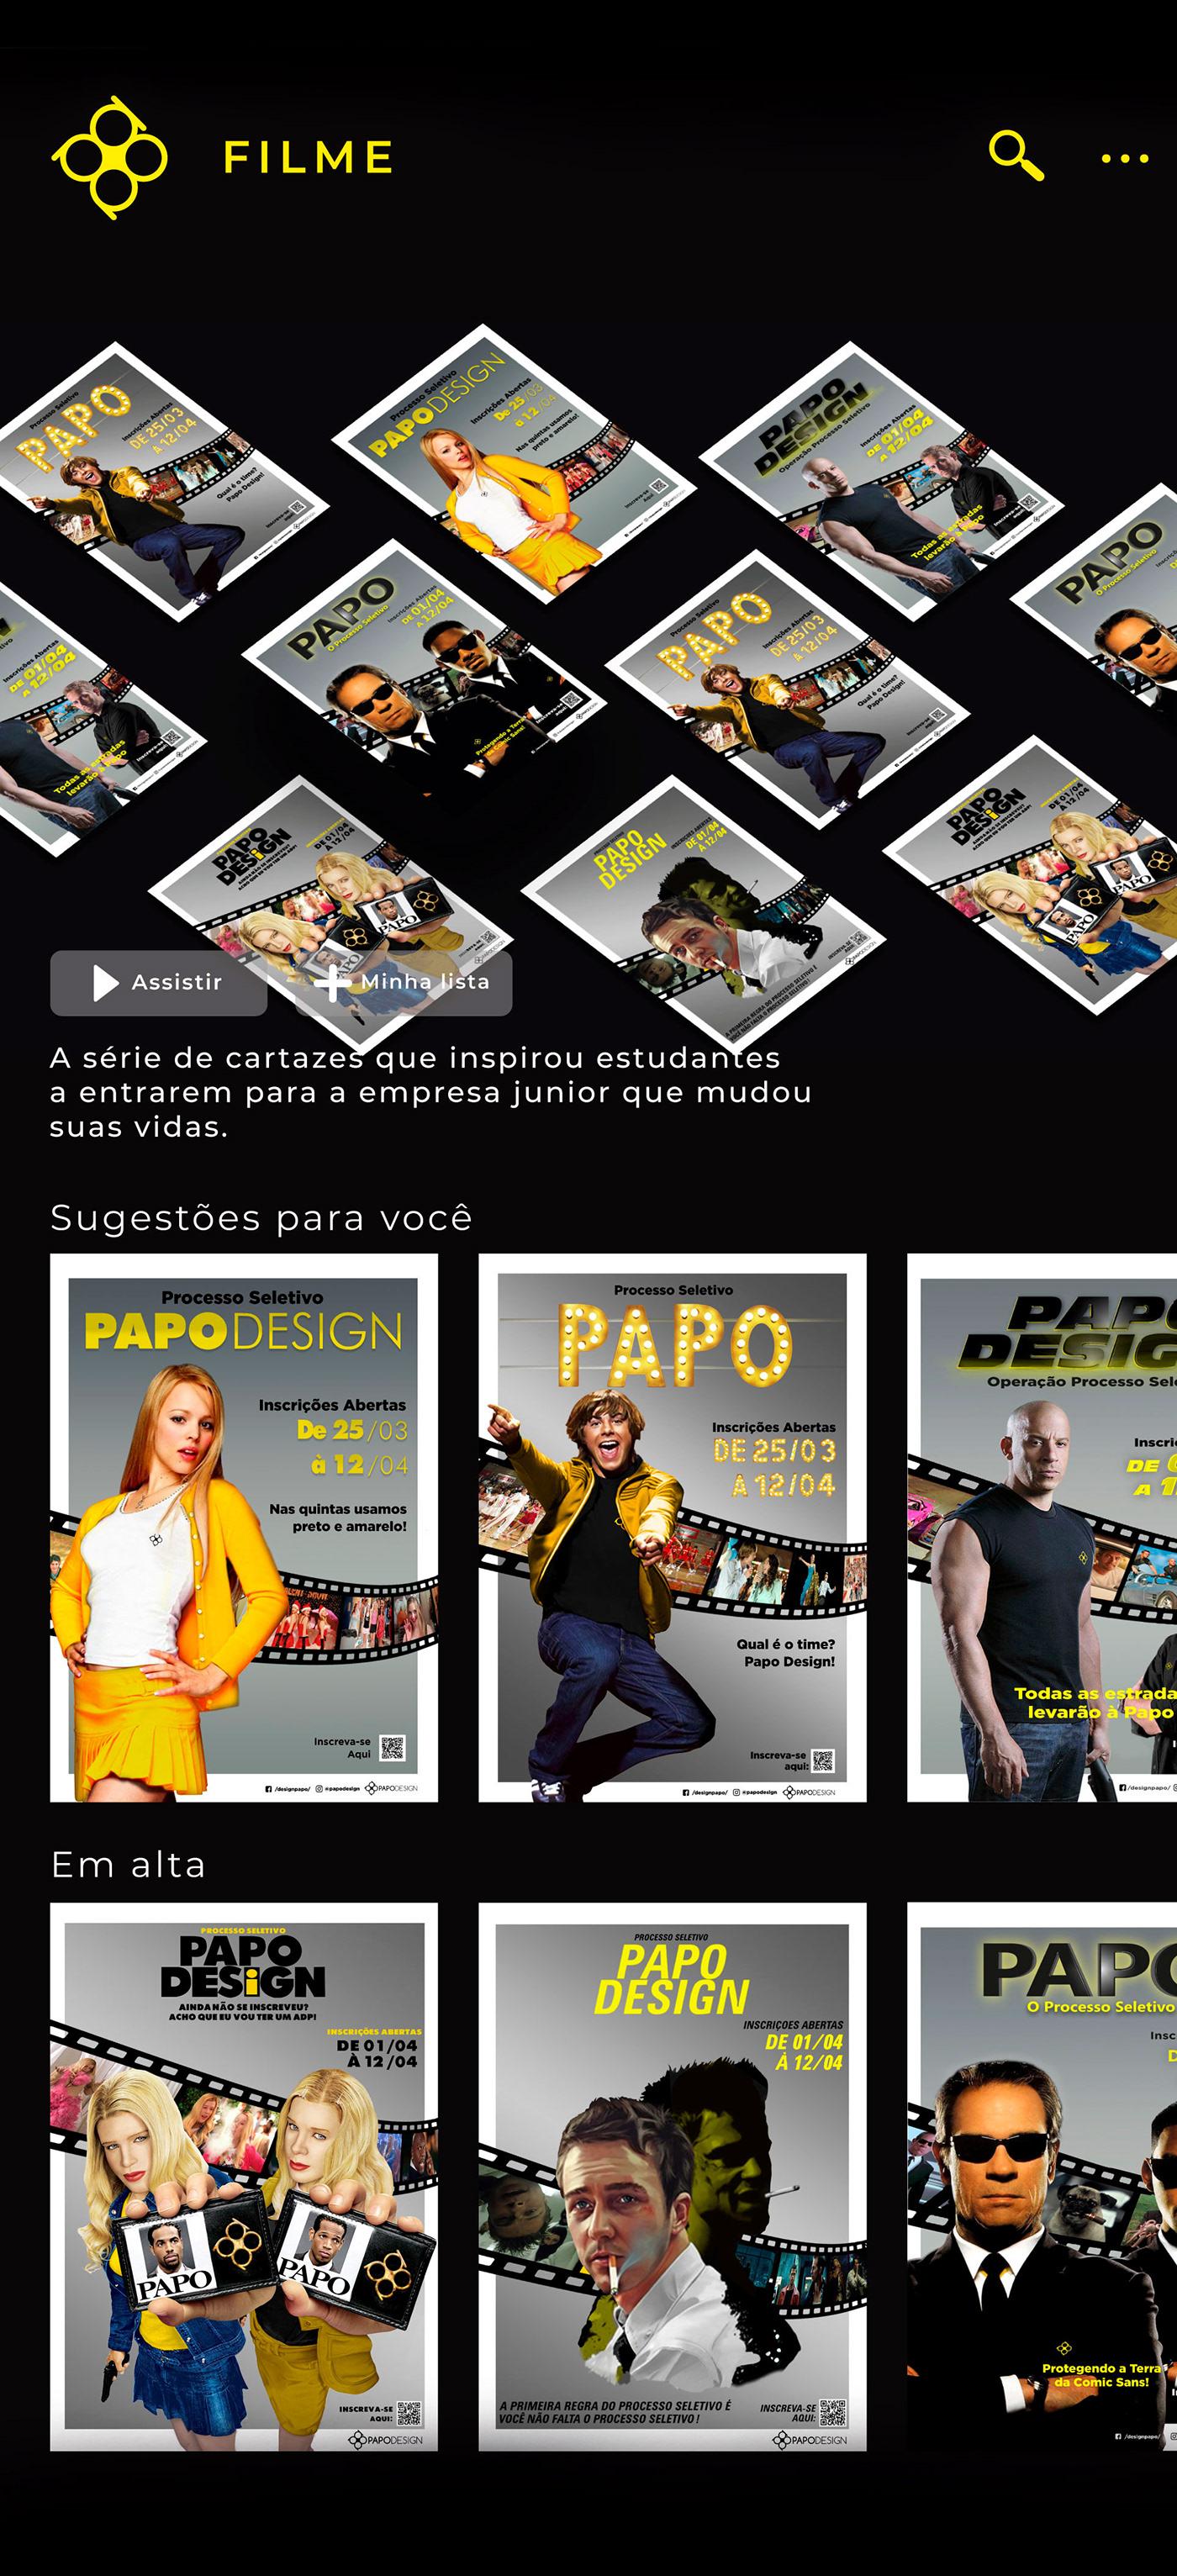 #cartaz  #filmes #movie #photoshop #Processo #seletivo